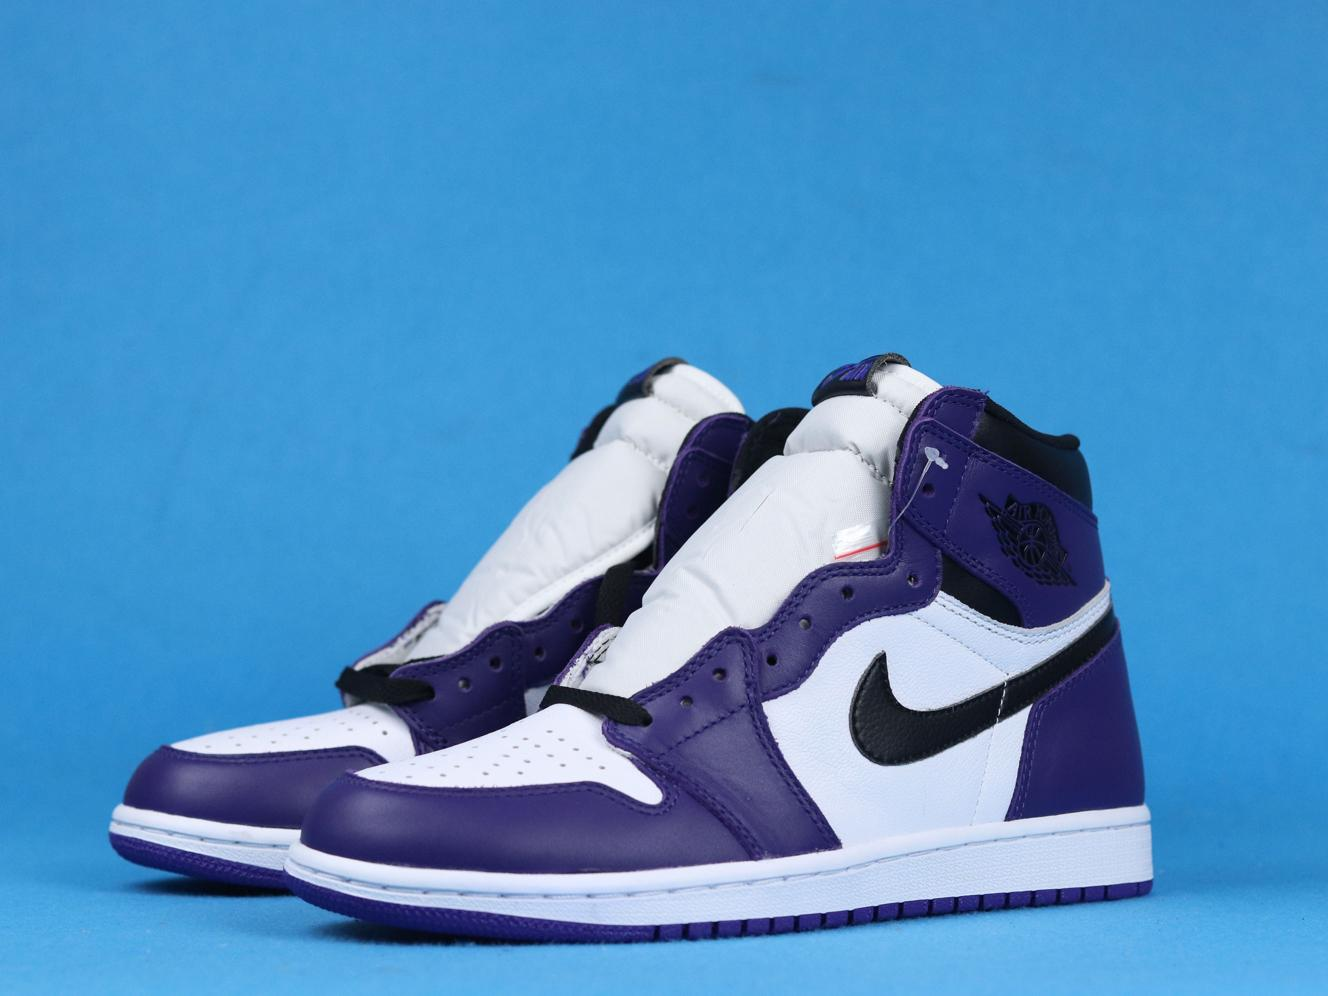 Air Jordan 1 Retro High OG Court Purple 2.0 6